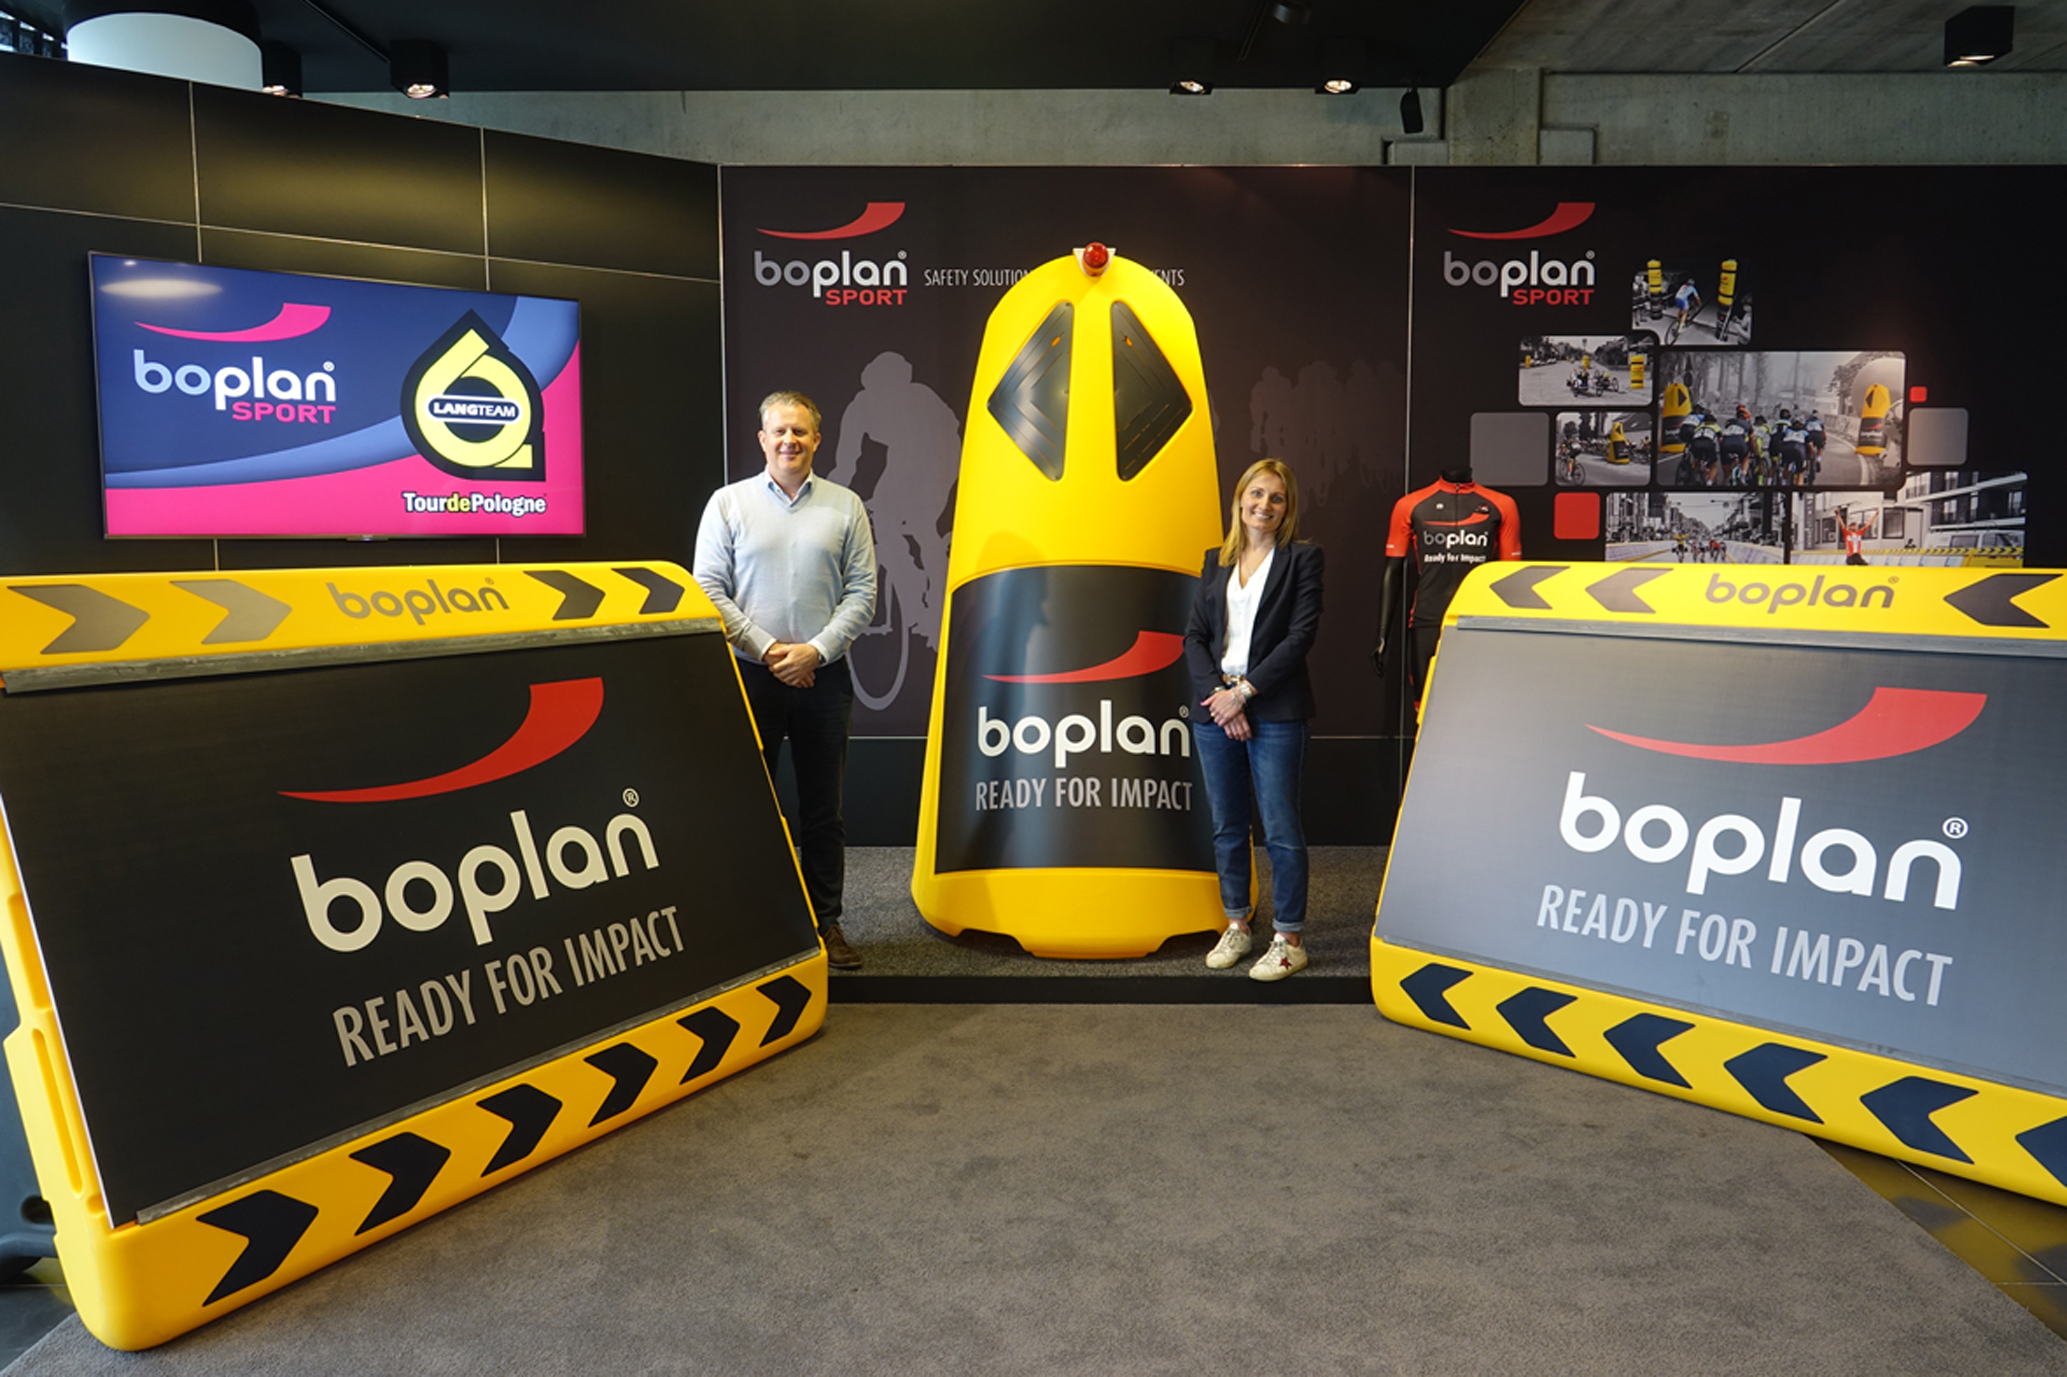 boplan-nieuwe-partner-tour-de-pologne